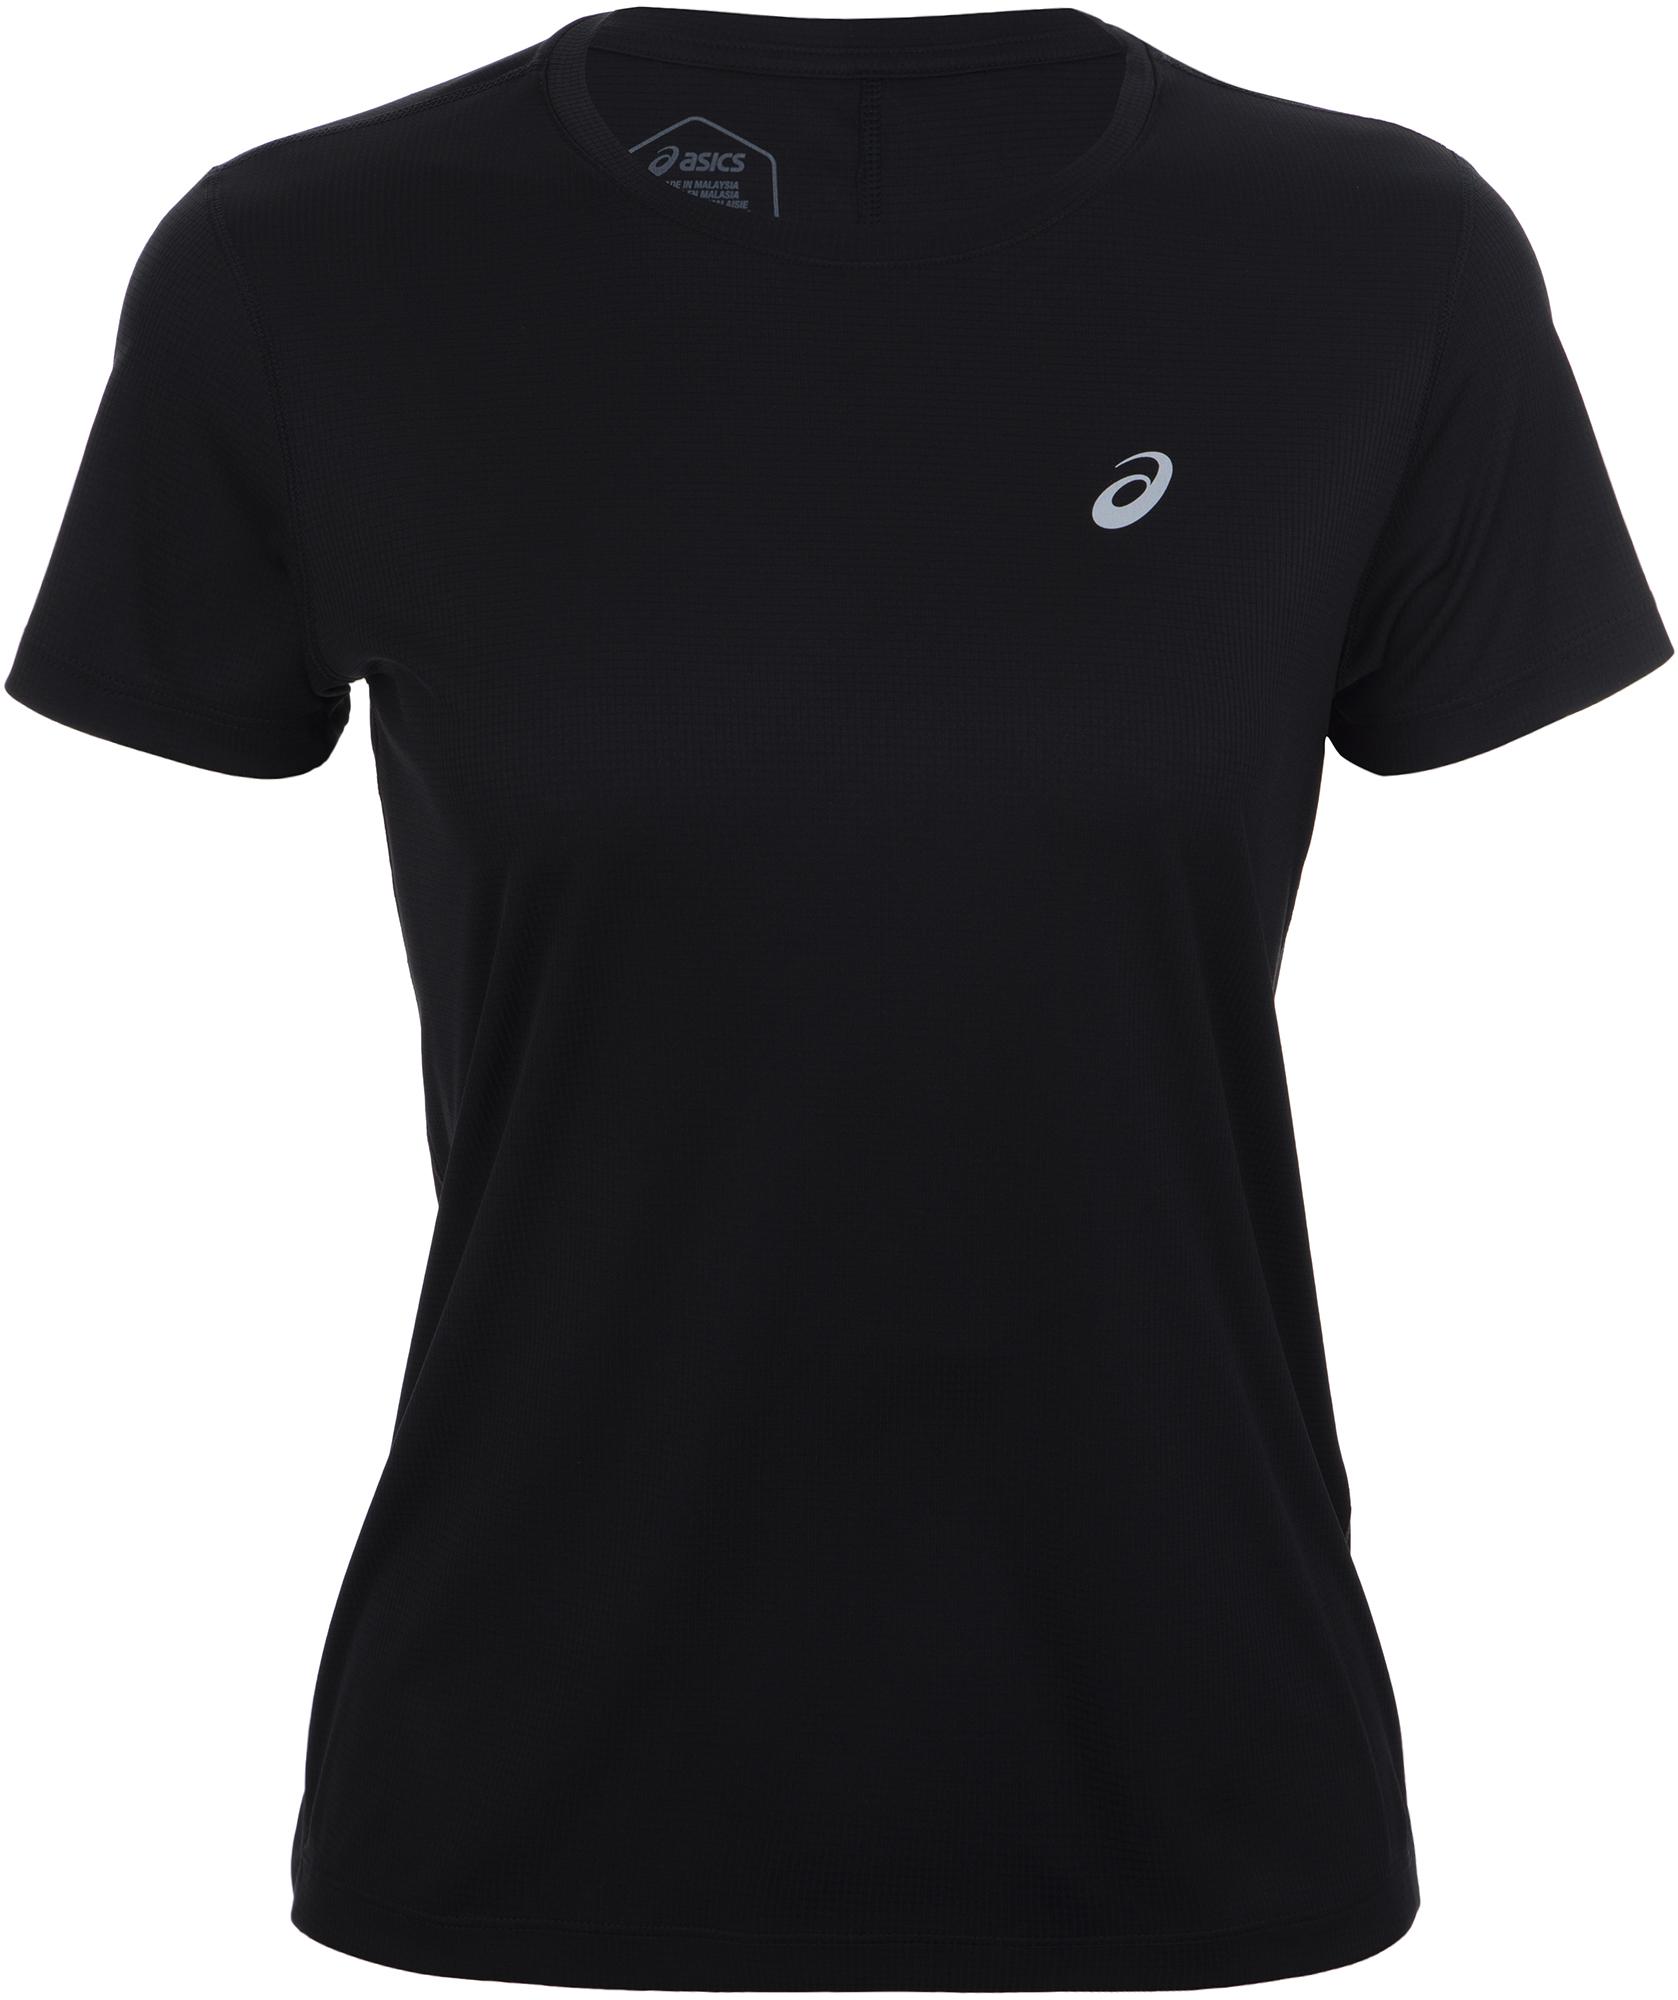 футболка женская oodji ultra цвет бежево розовый 14701005 7b 46147 4b00n размер s 44 ASICS Футболка женская ASICS Silver, размер 44-46